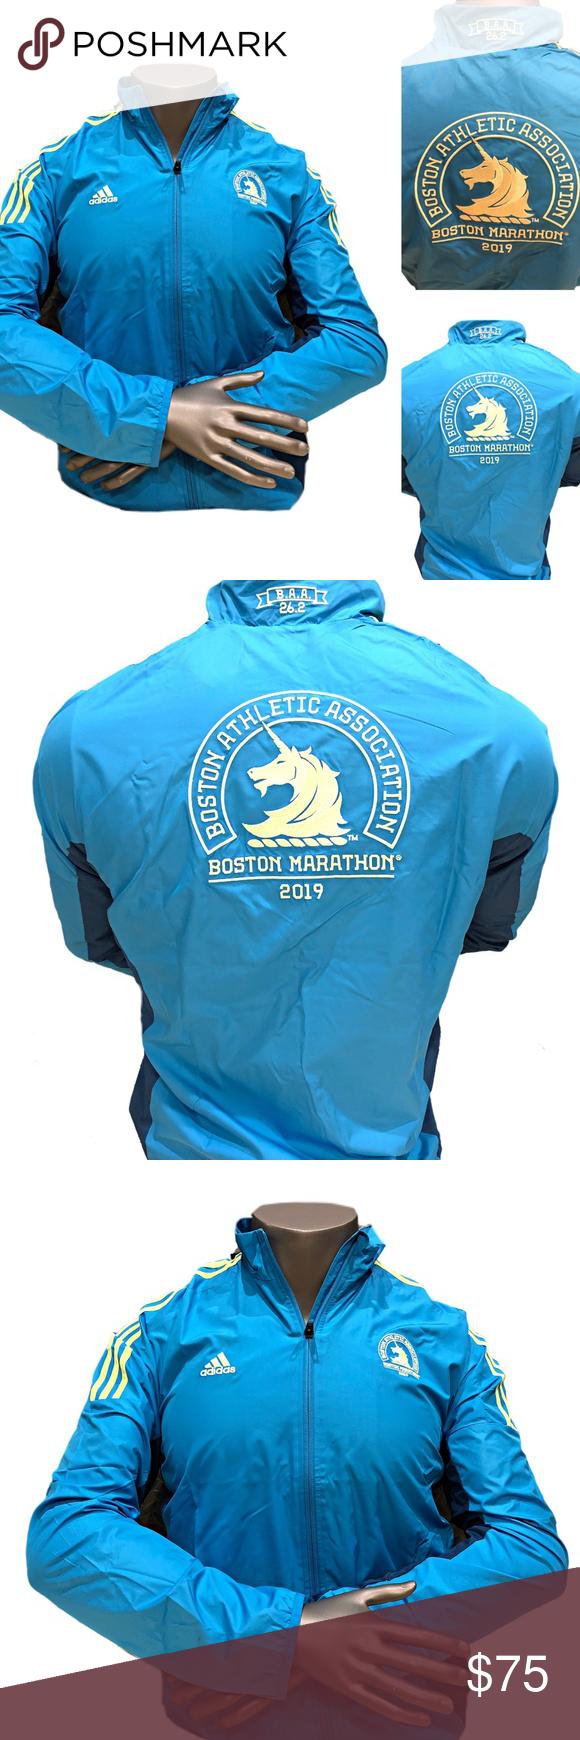 Adidas Boston Marathon Celebration Mens Jacket New Mens Jackets Running Clothes Jackets